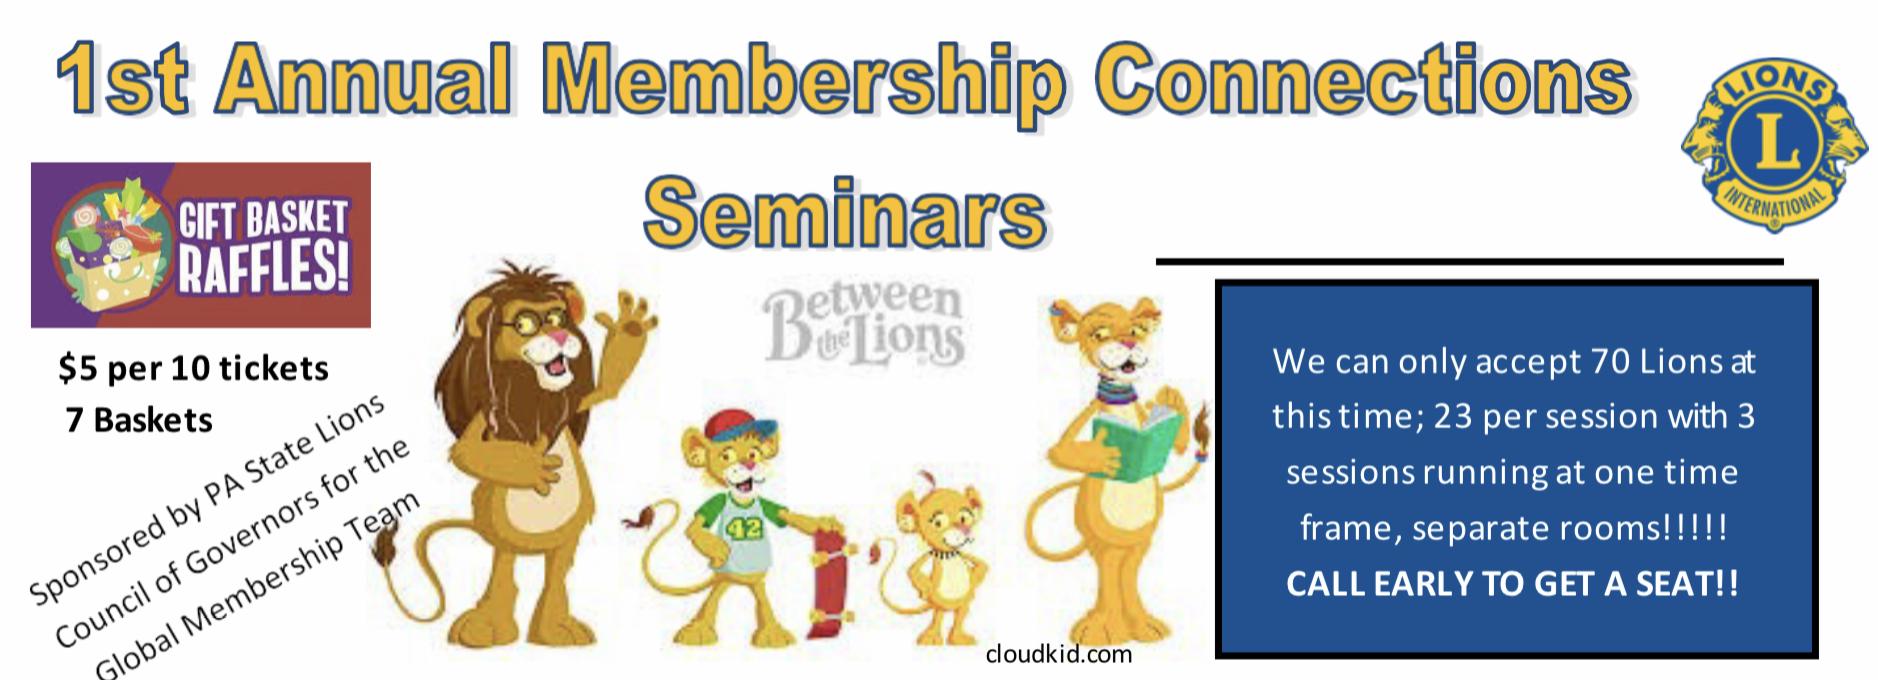 Membership Connections Seminar